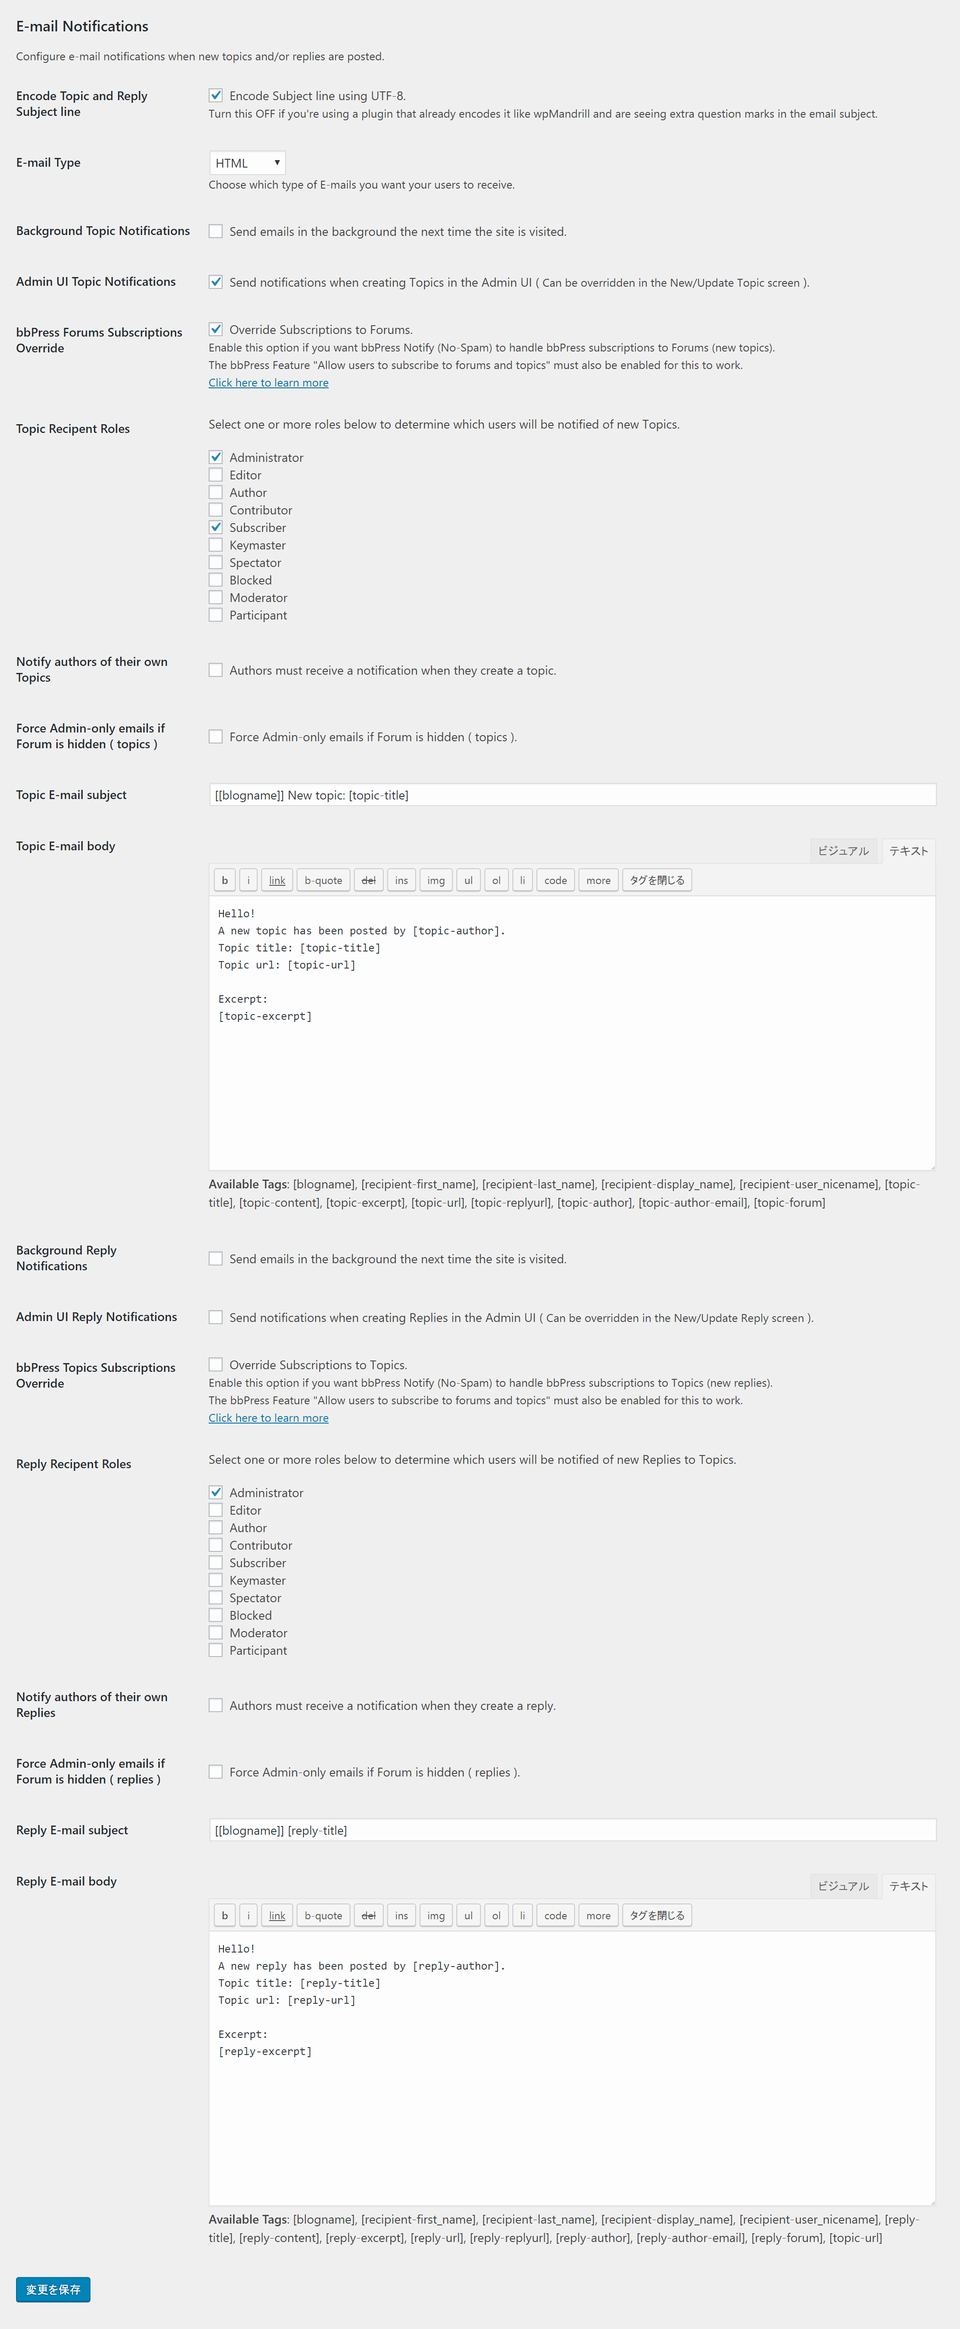 bbpressの通知メールの件名 内容をカスタマイズする方法 左坊のメモ帳